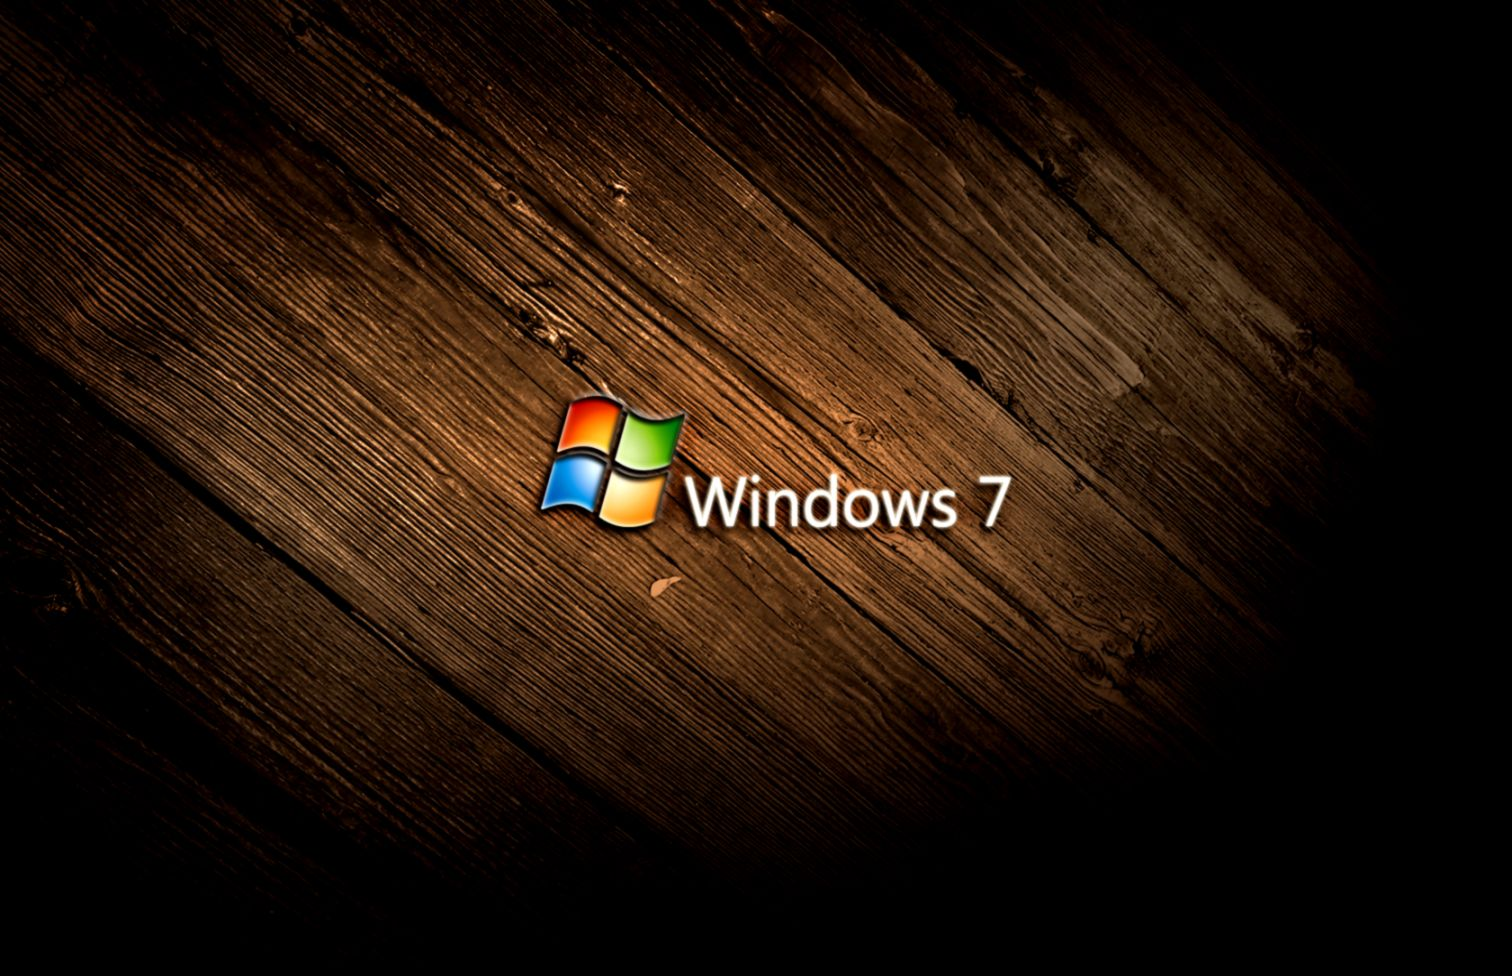 HD Wallpapers for Windows 7 Desktop Backgrounds